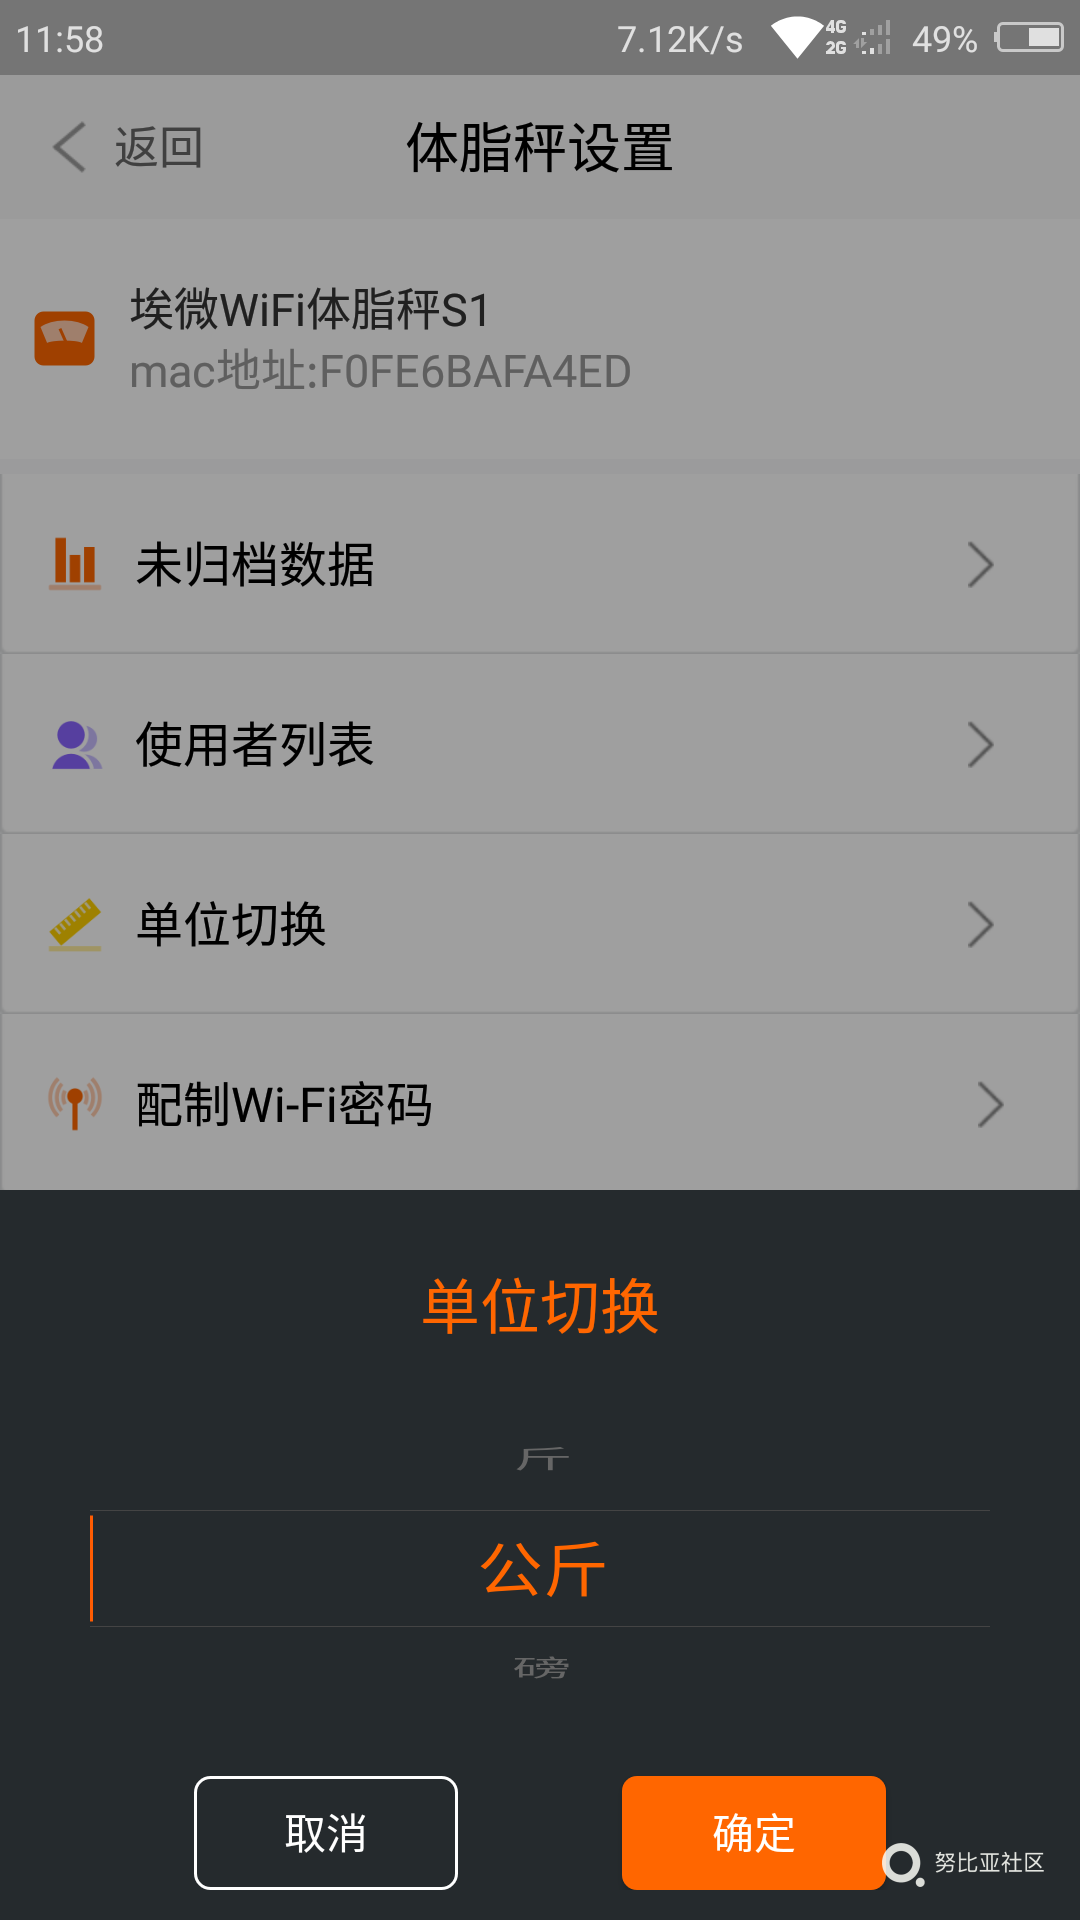 Screenshot_2018-01-31-11-58-02.png